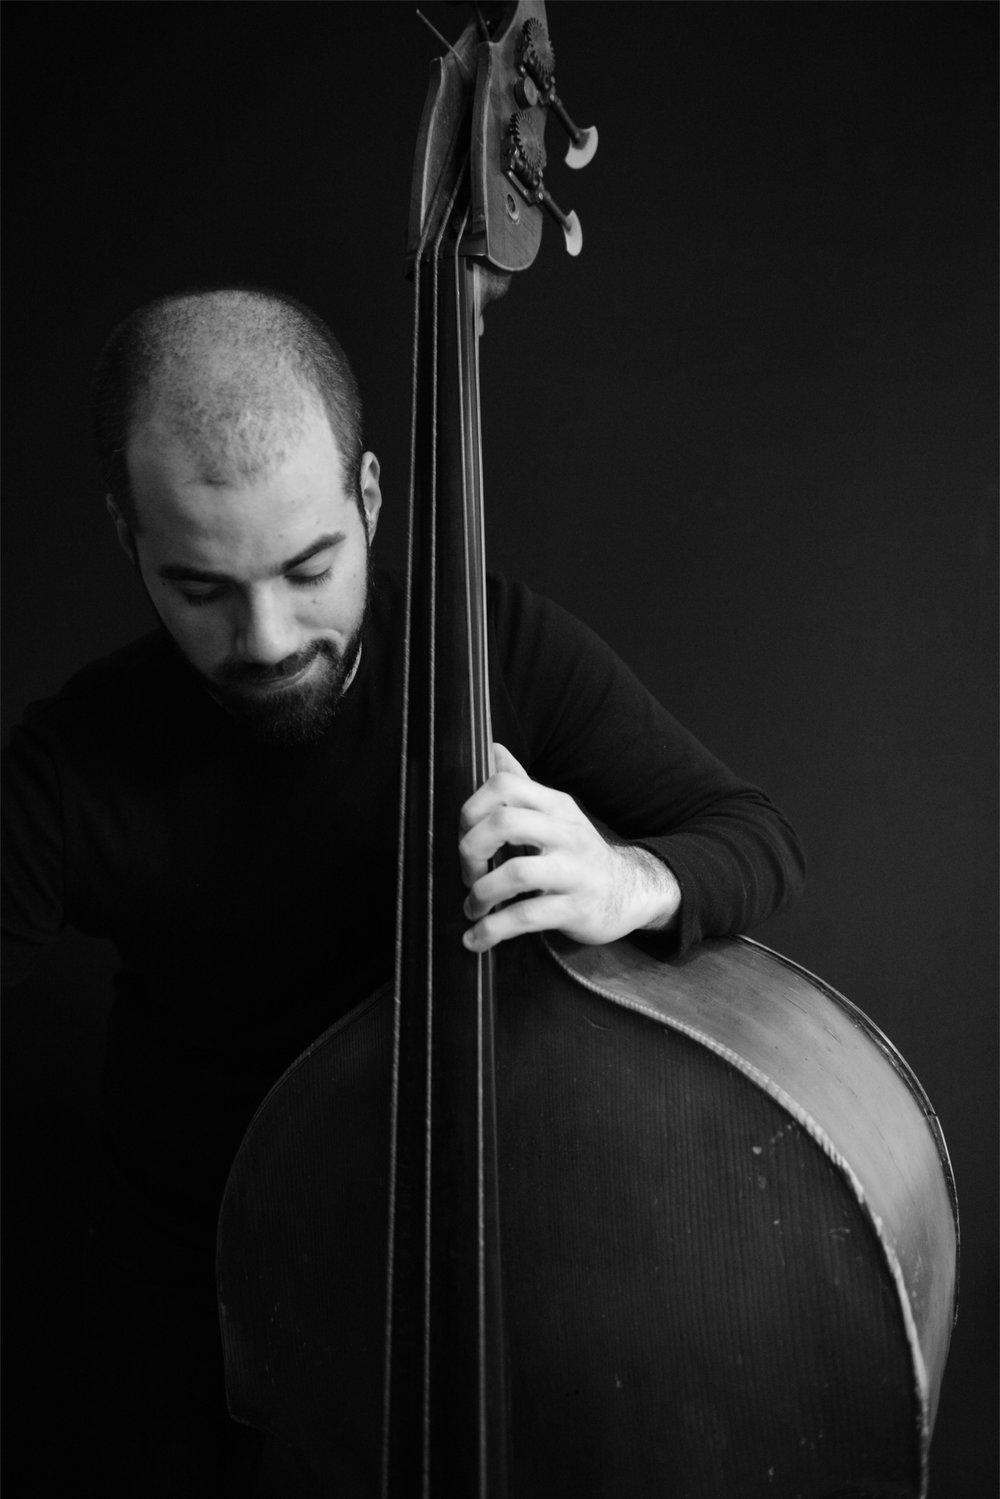 Severiano Paoli - International Double Bass Soloist